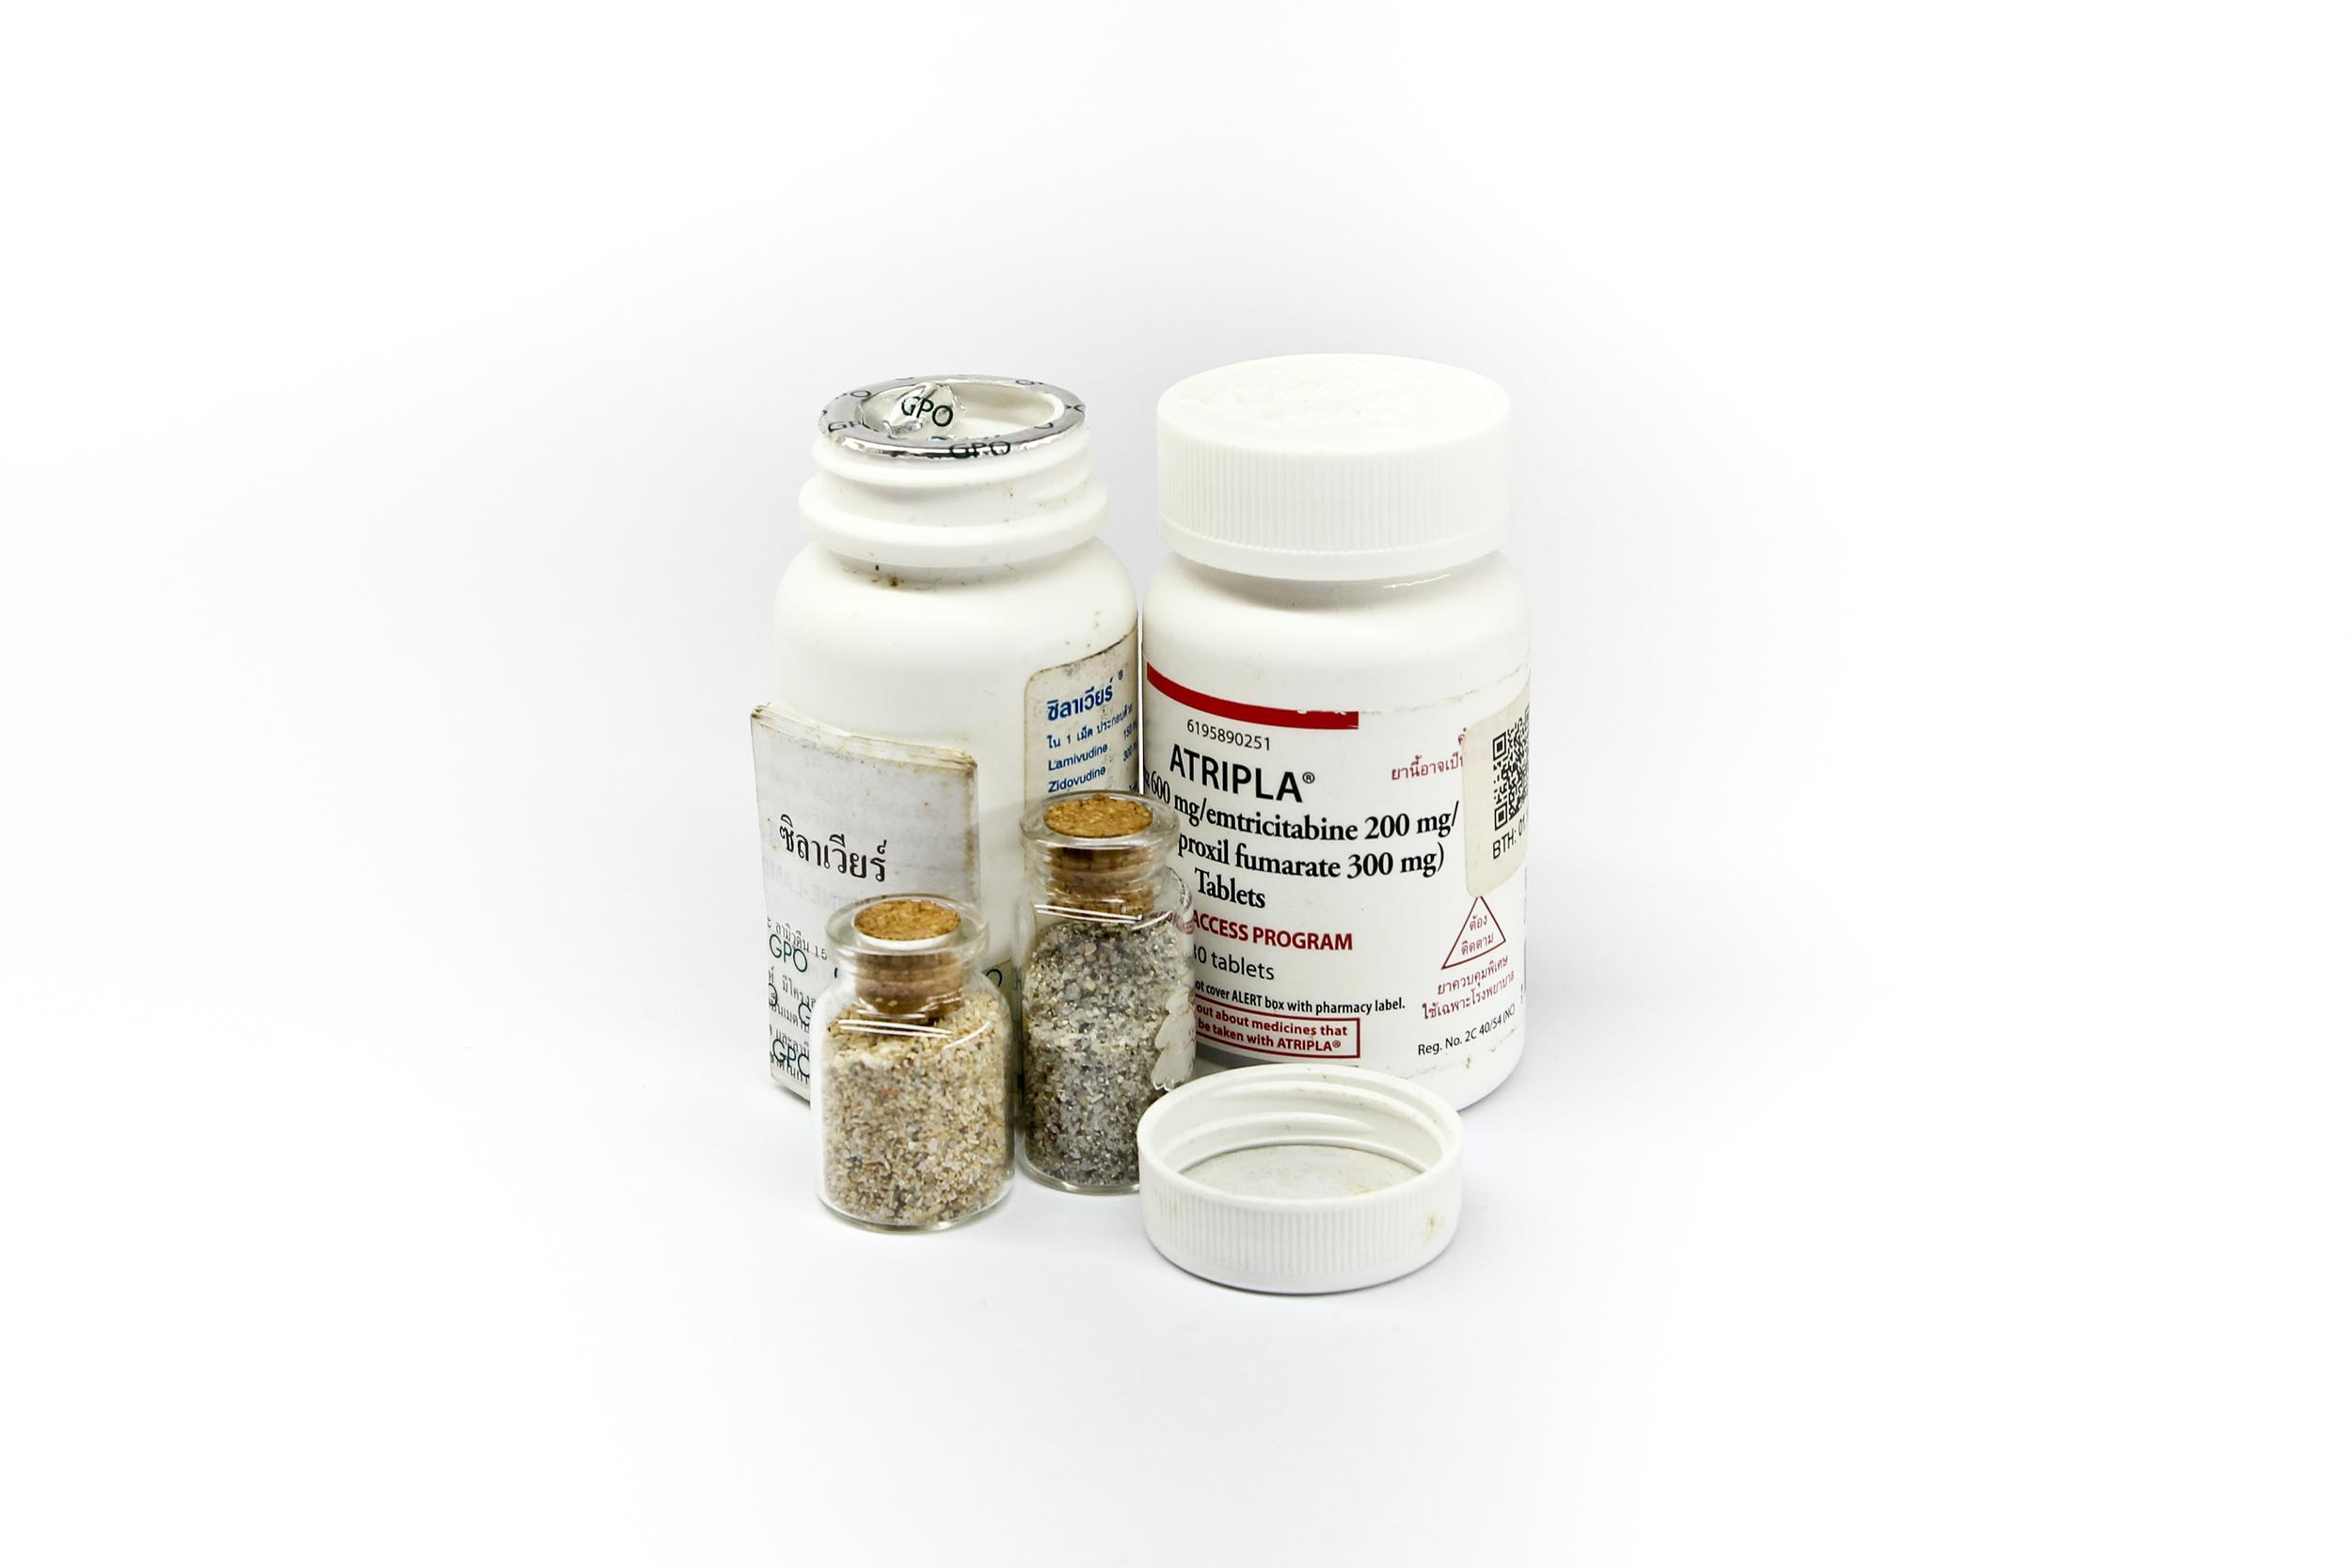 HIV medication bottle and sand